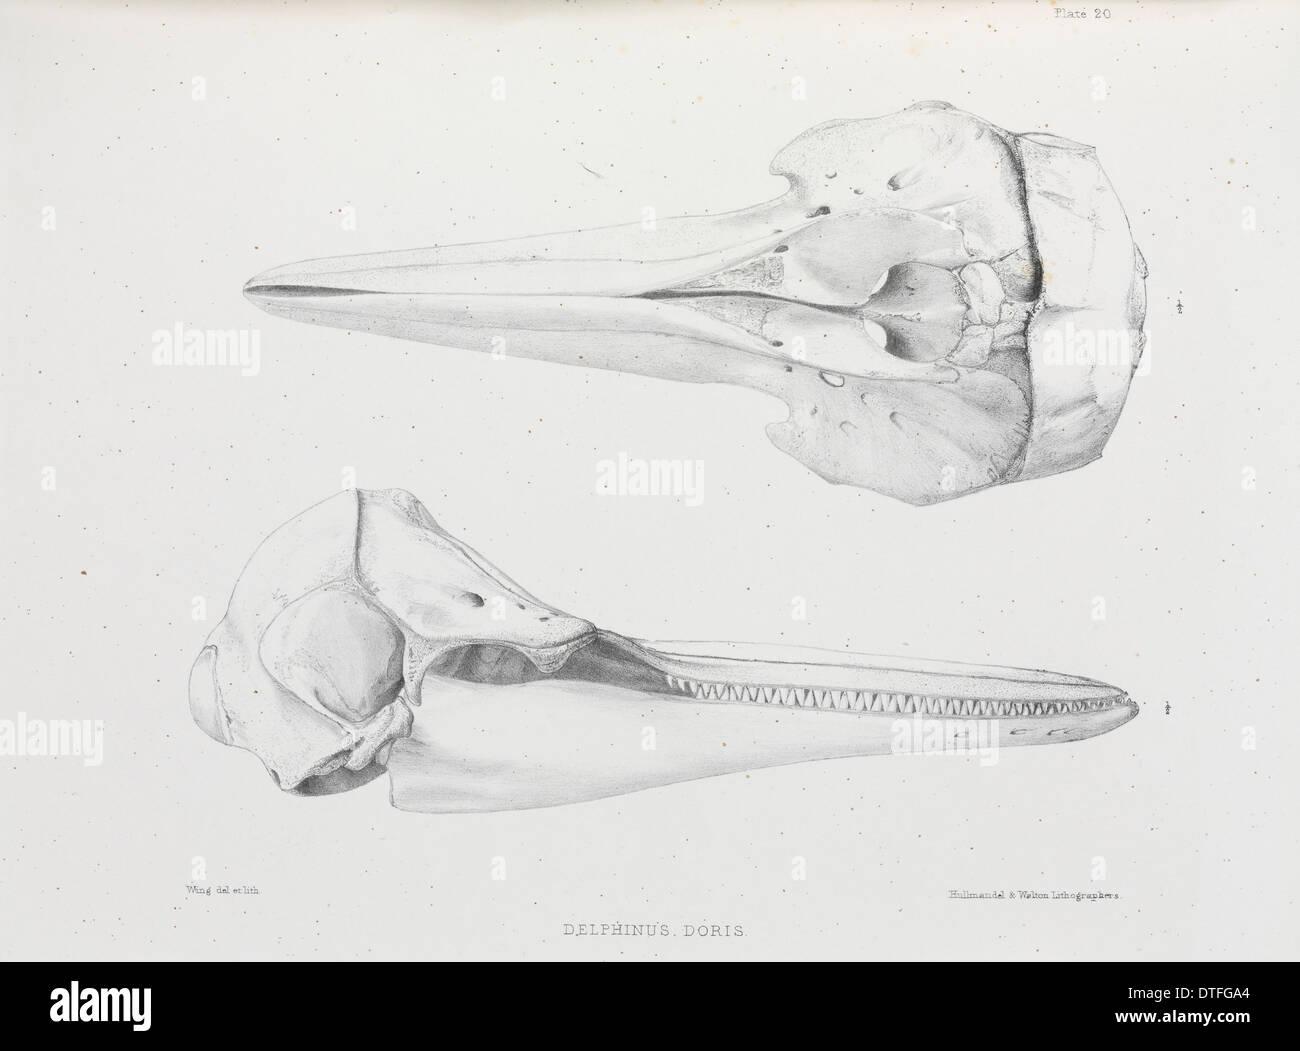 Delphinus doris, plate 20 - Stock Image